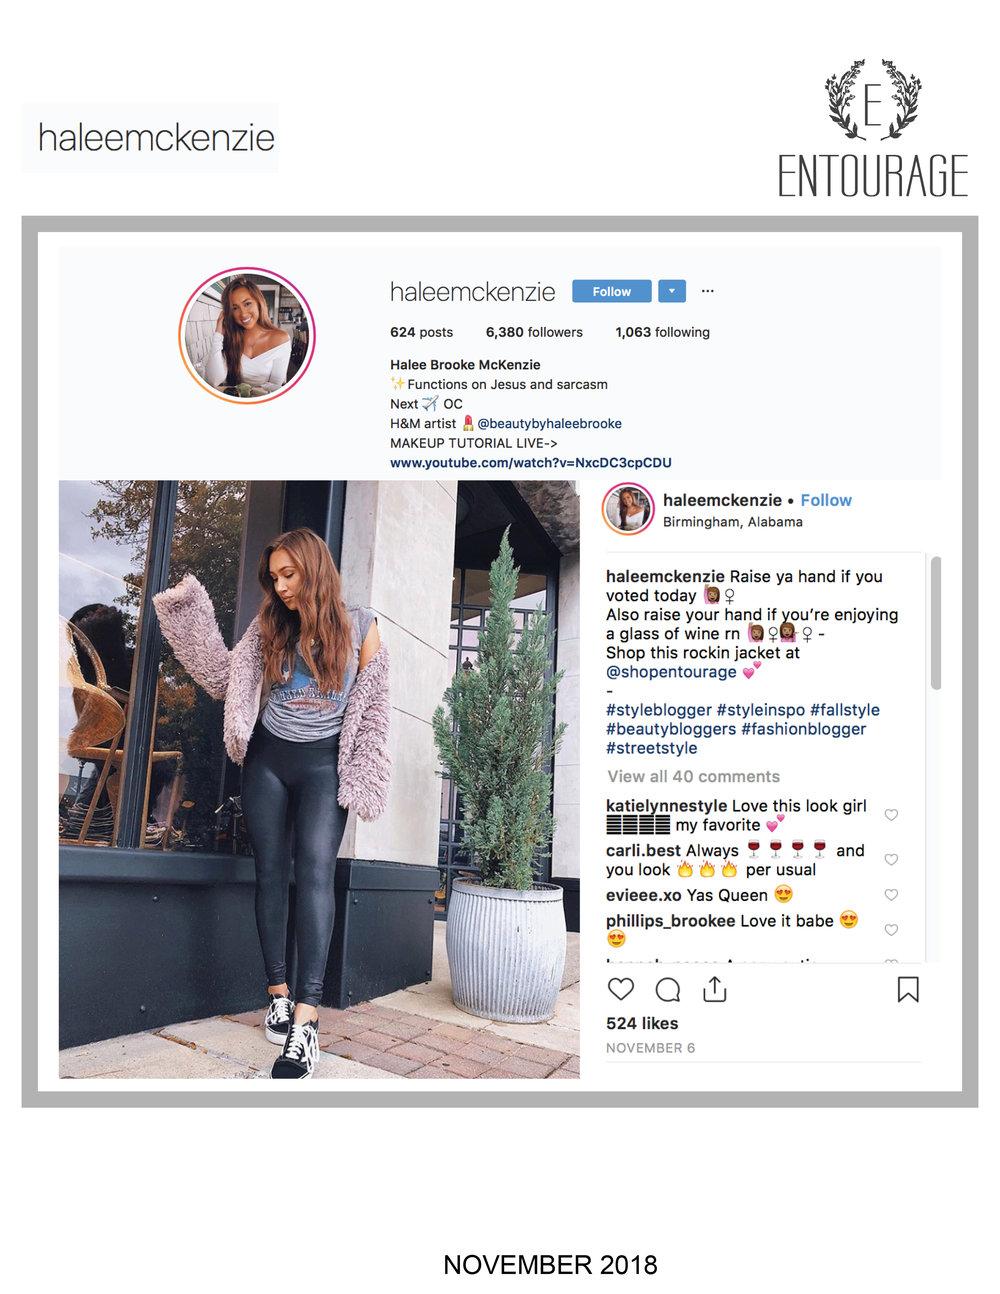 Entourage_HaleeMcKenzie_November2018.jpg